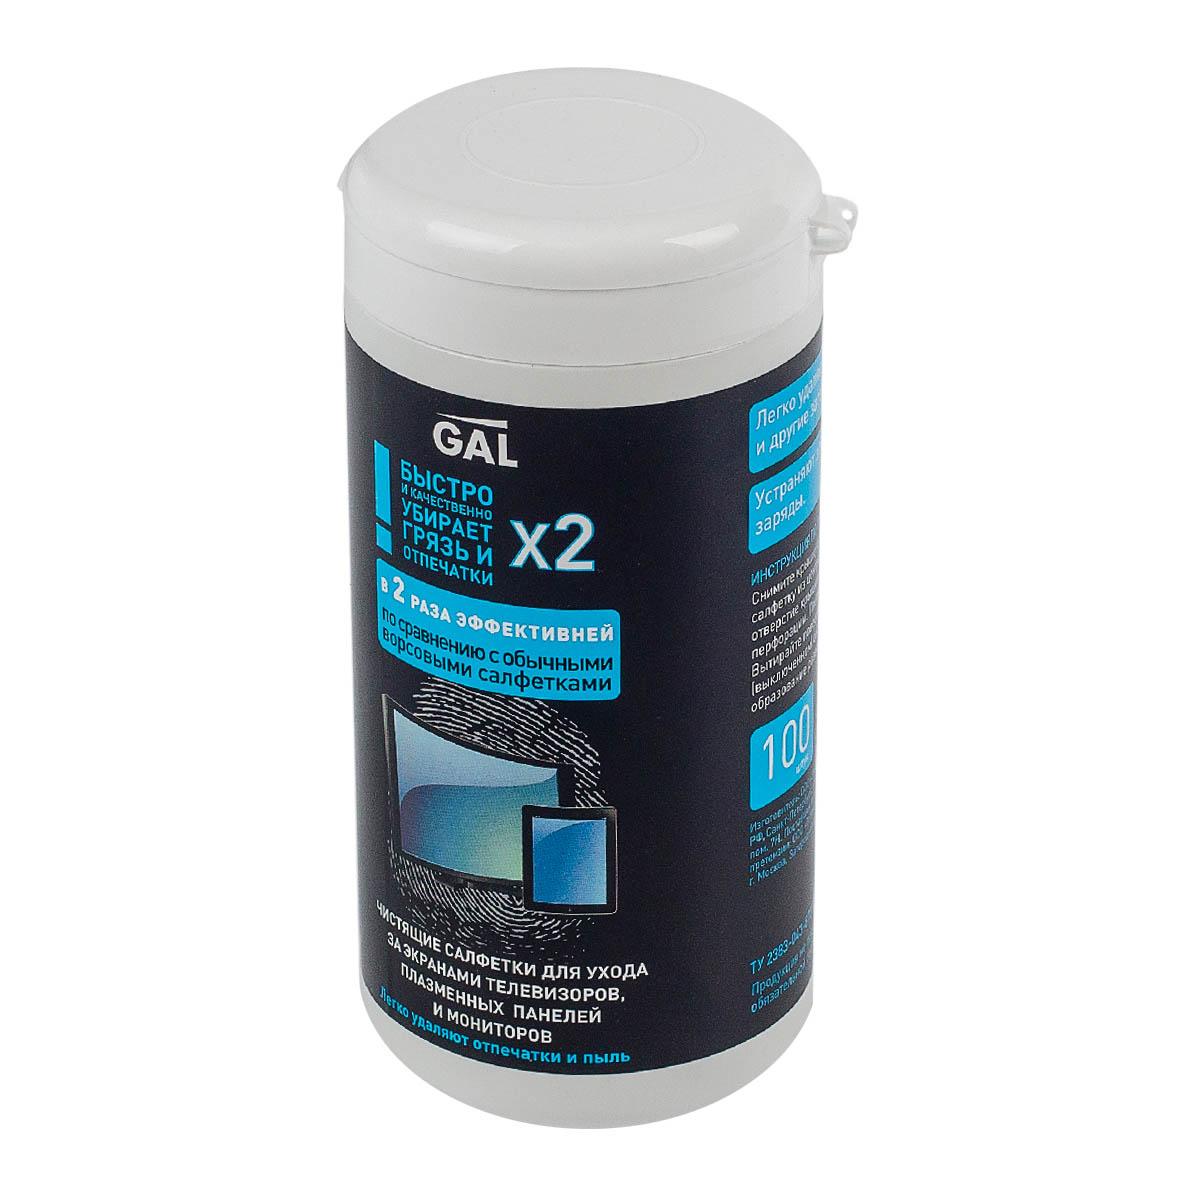 GAL CL120